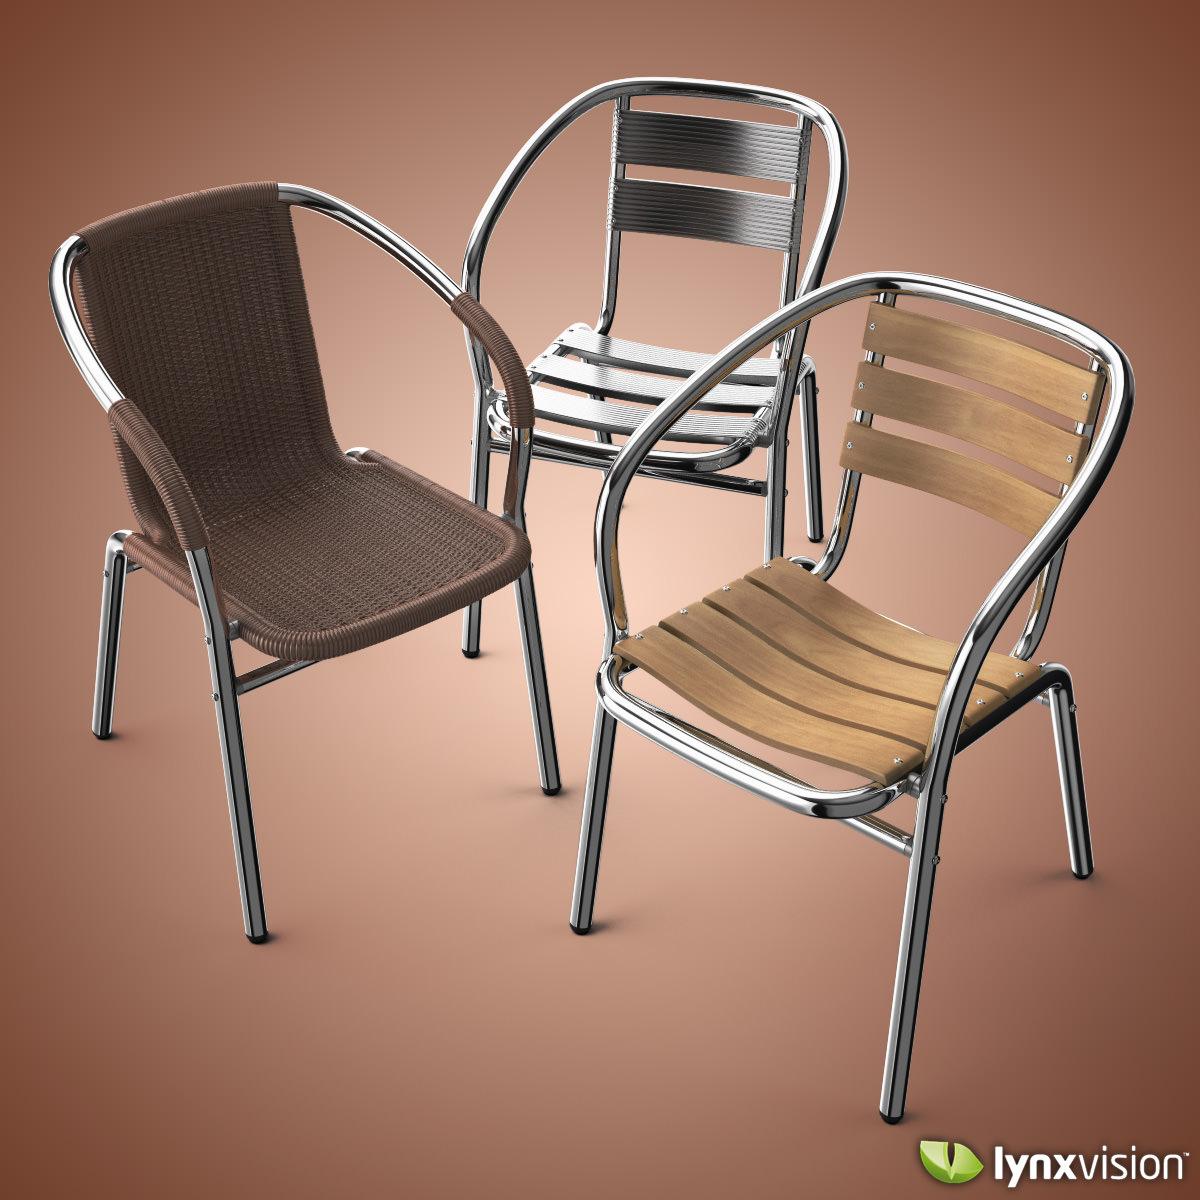 outdoor aluminum chairs collection 3d model max obj fbx c4d lwo lw lws lxo lxl 1 - Garden Furniture 3d Model